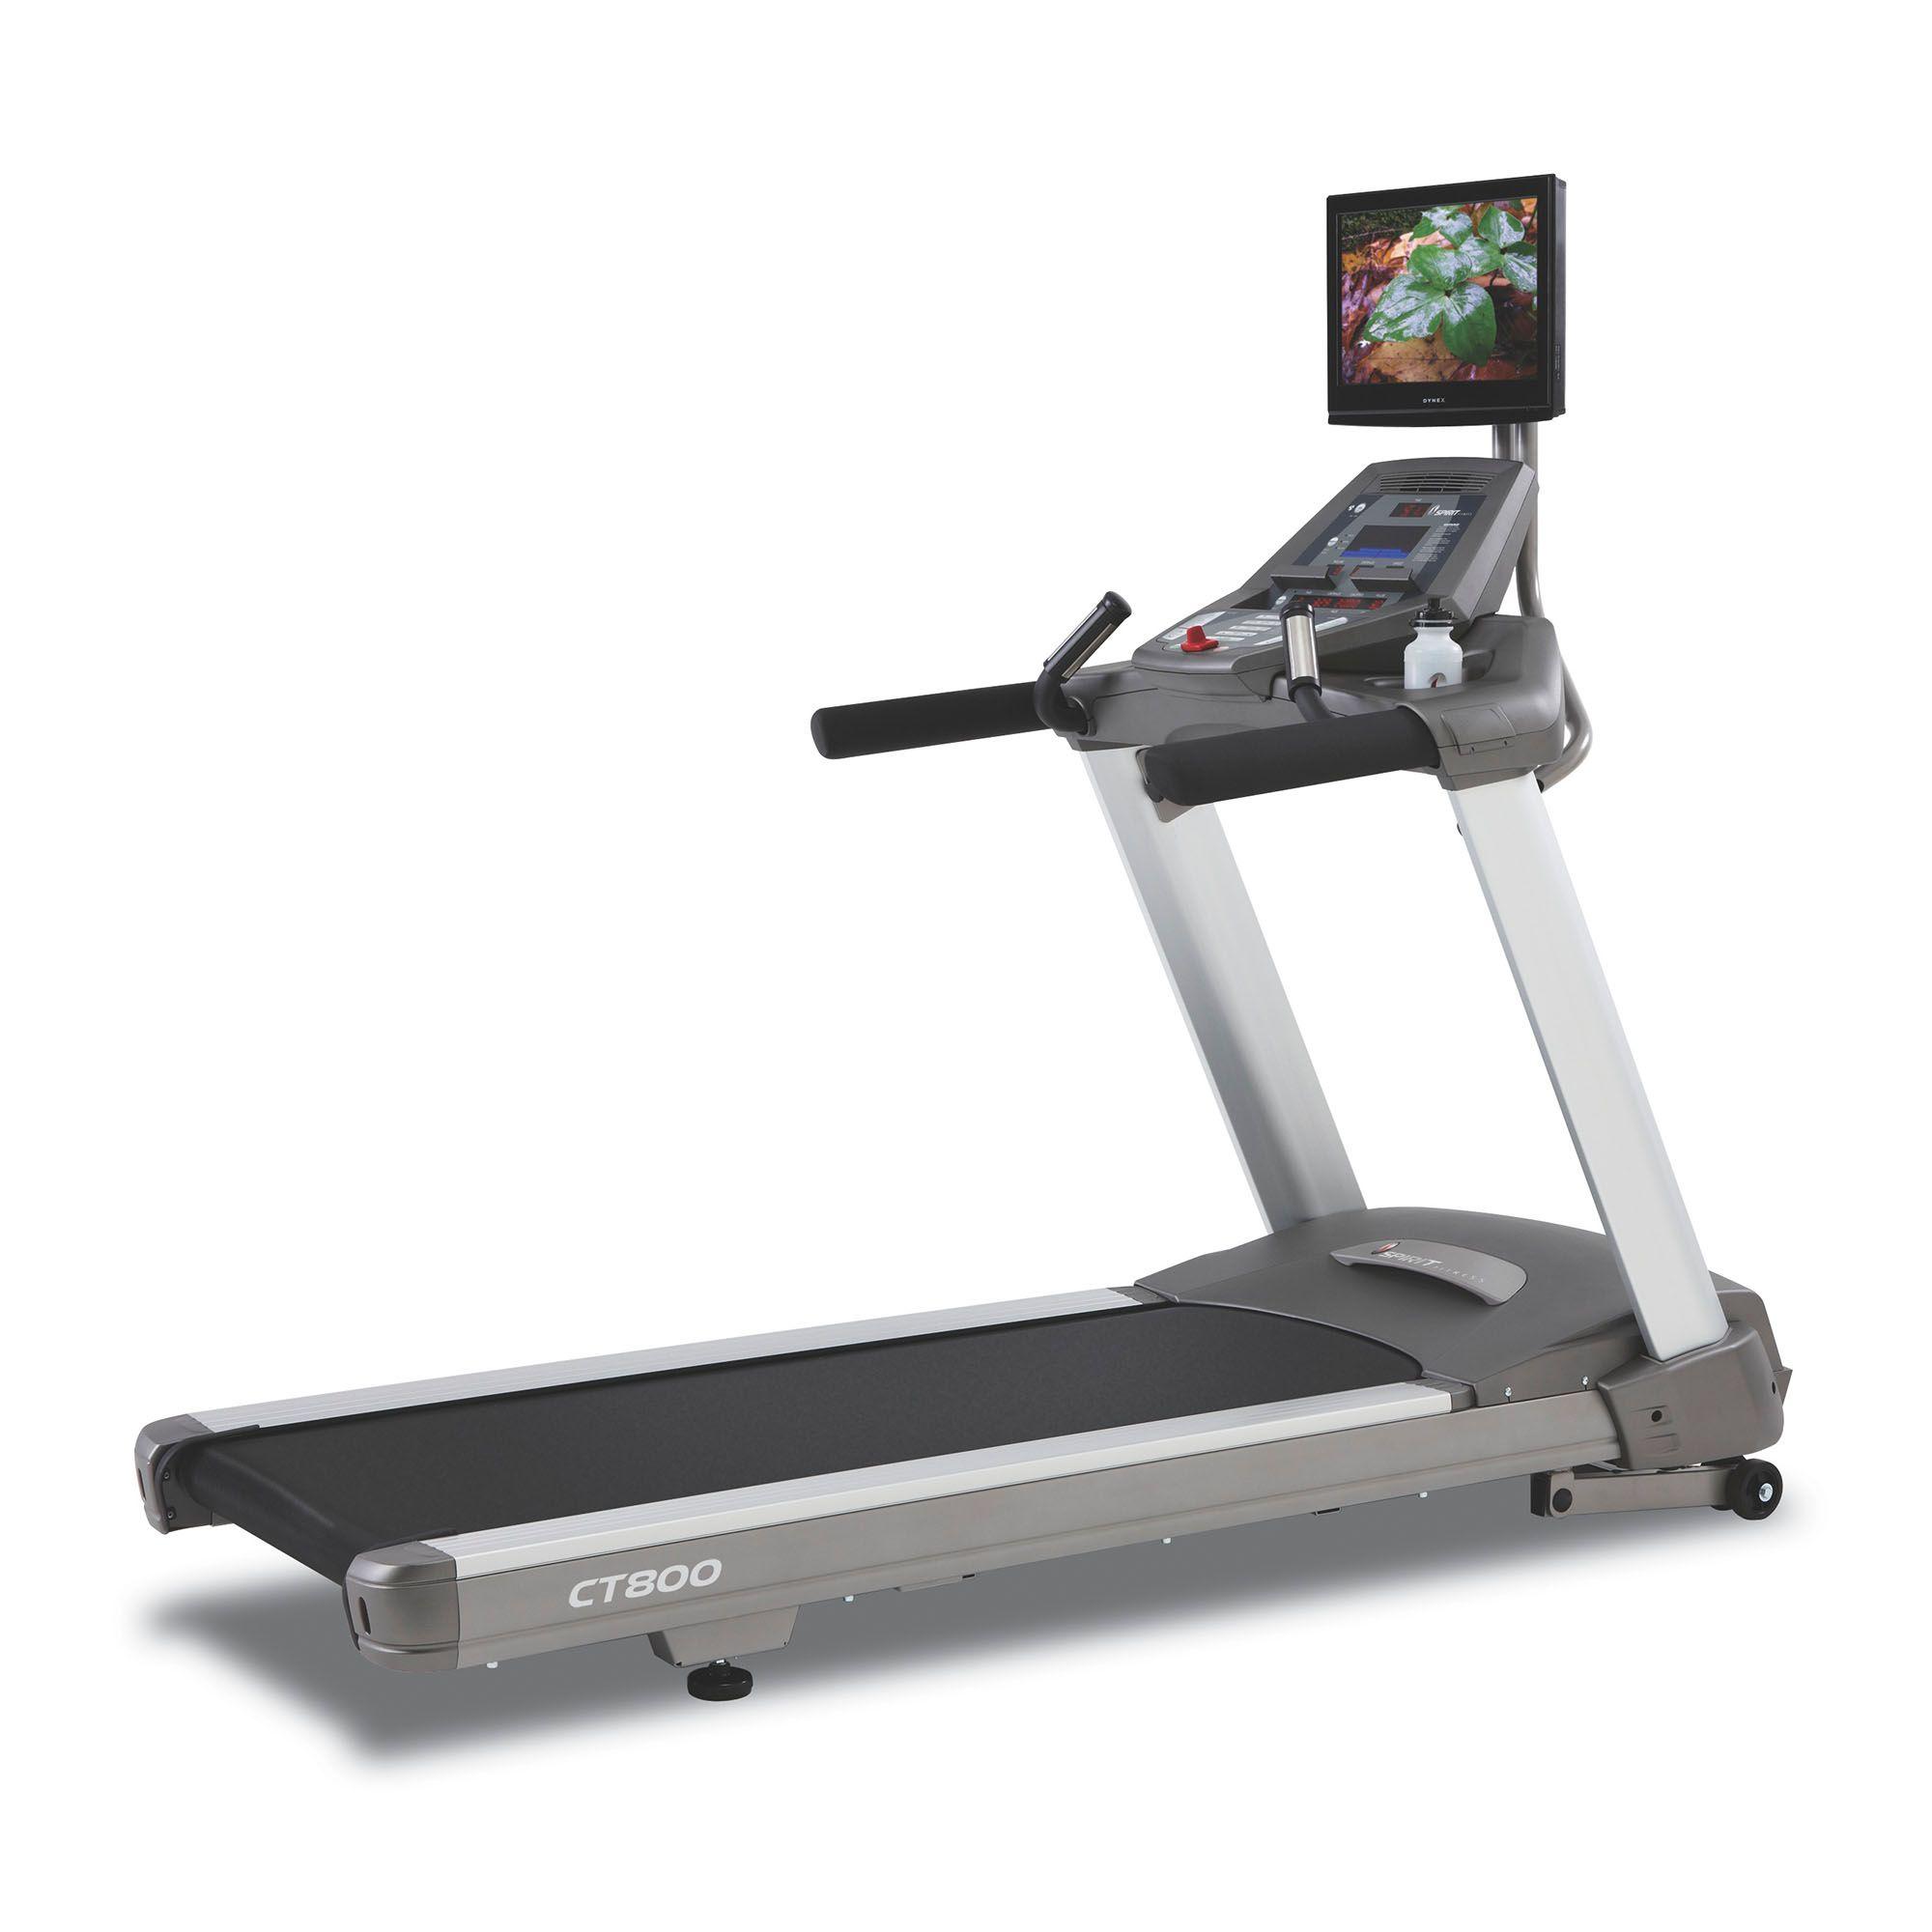 Cybex Treadmill Heart Rate Monitor: Spirit CT800 Treadmill With Medical Handrails